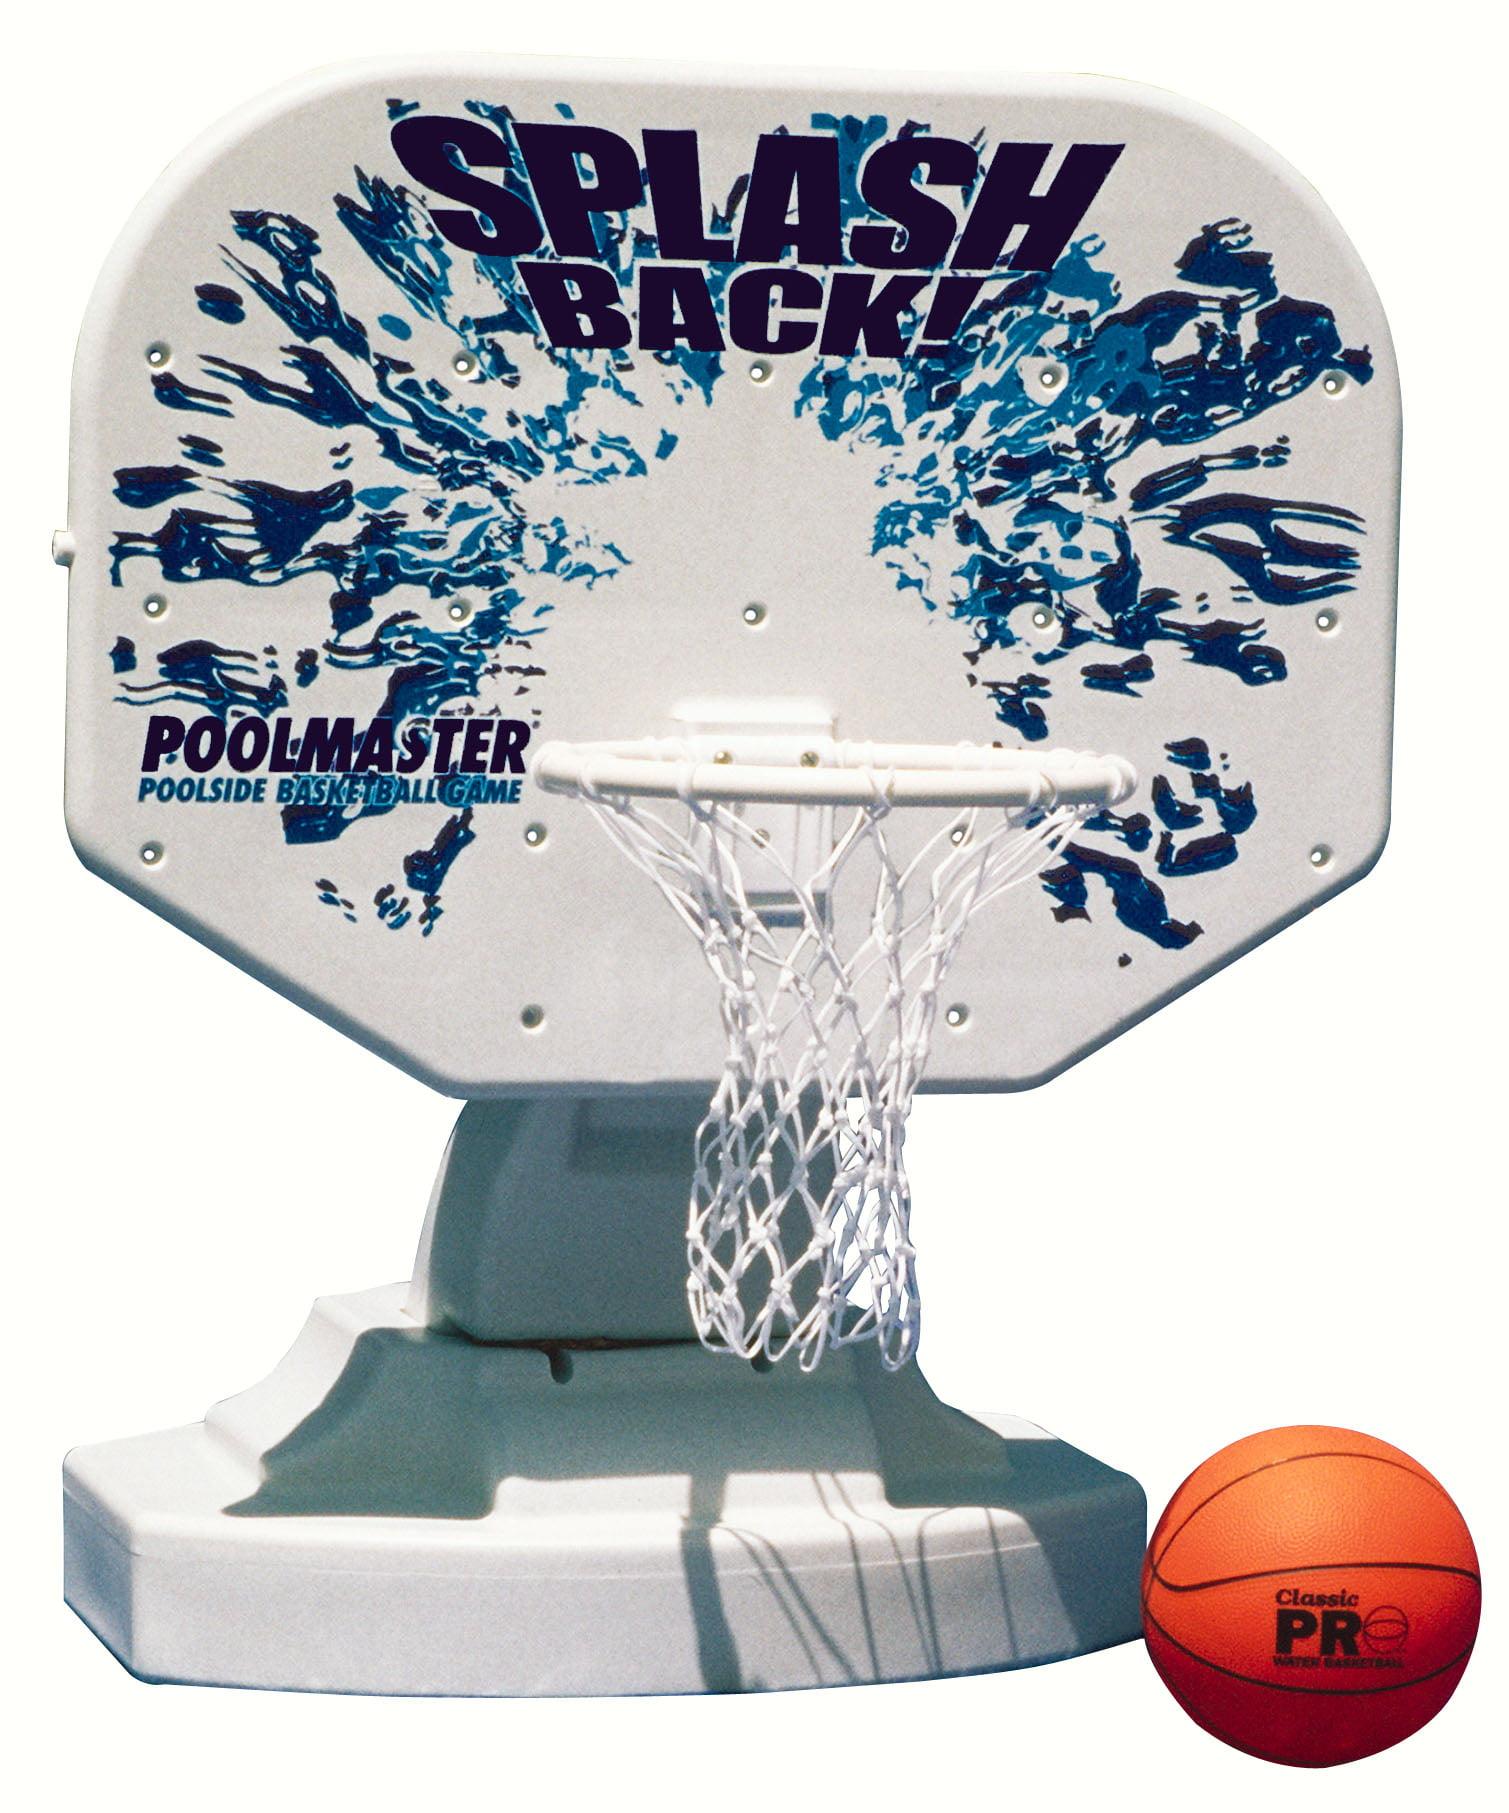 Poolmaster Splashback Poolside Basketball Game for Swimming Pools by Poolmaster